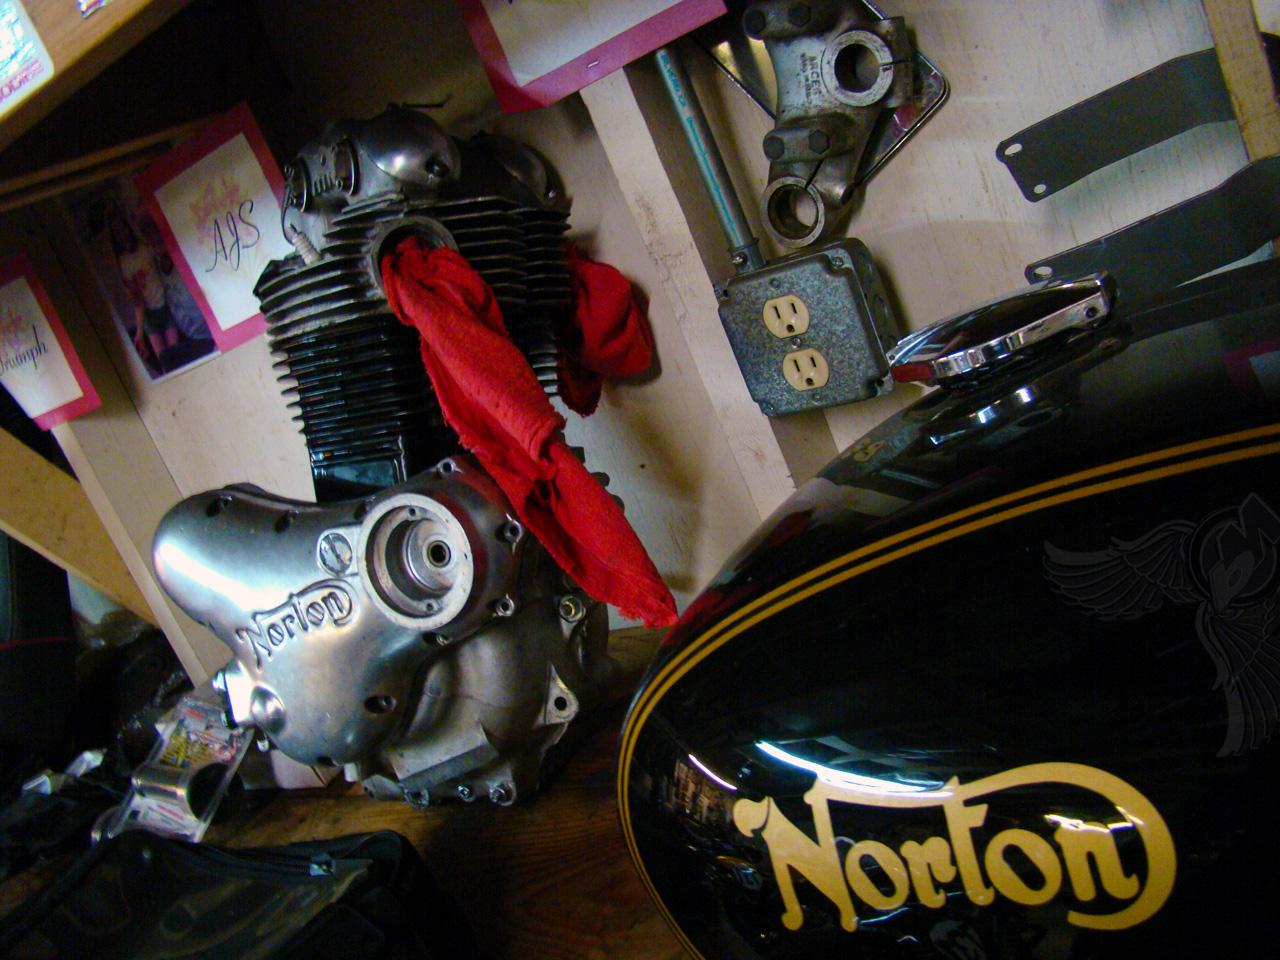 Stan Keyes From Cyco Cycle At His Home Garage Bikermetric